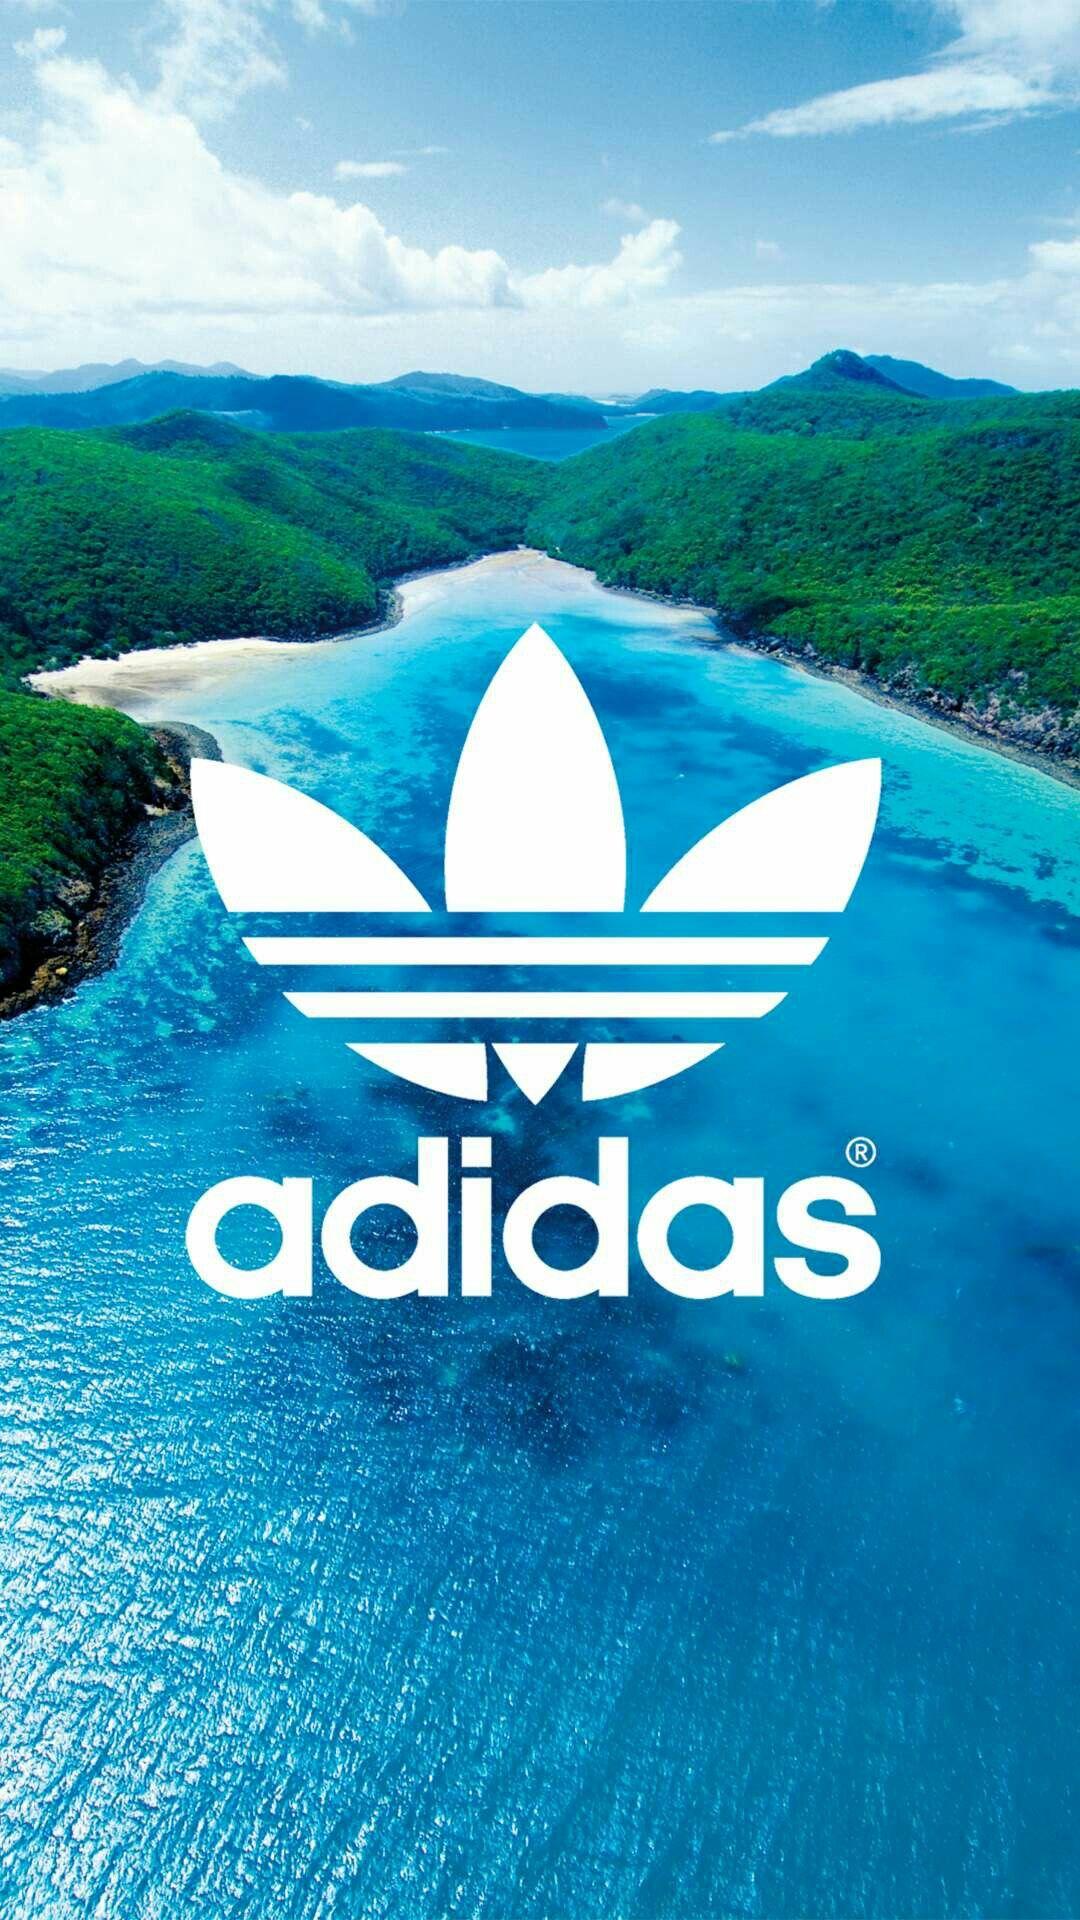 Adidas Background | Adidas | Adidas iphone wallpaper, Nike ...